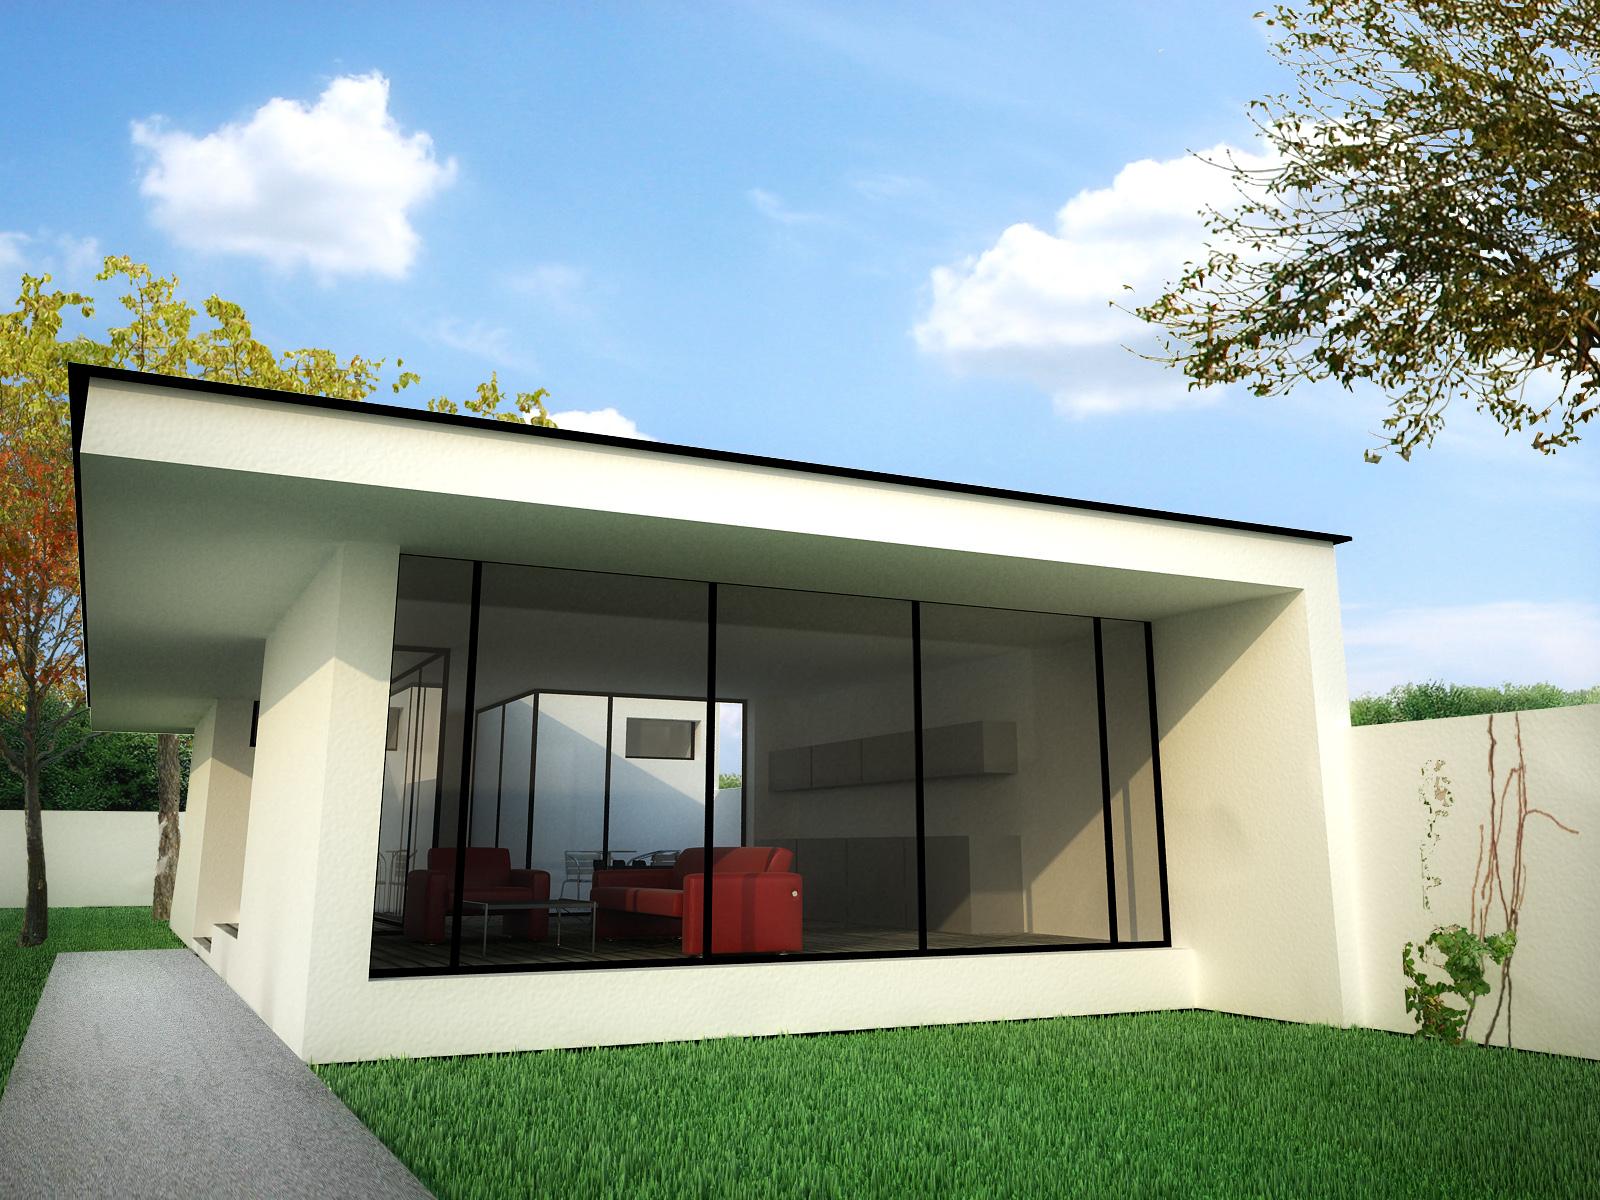 Interesting guardare disegno di x proiecte de case moderne - Case moderne immagini ...